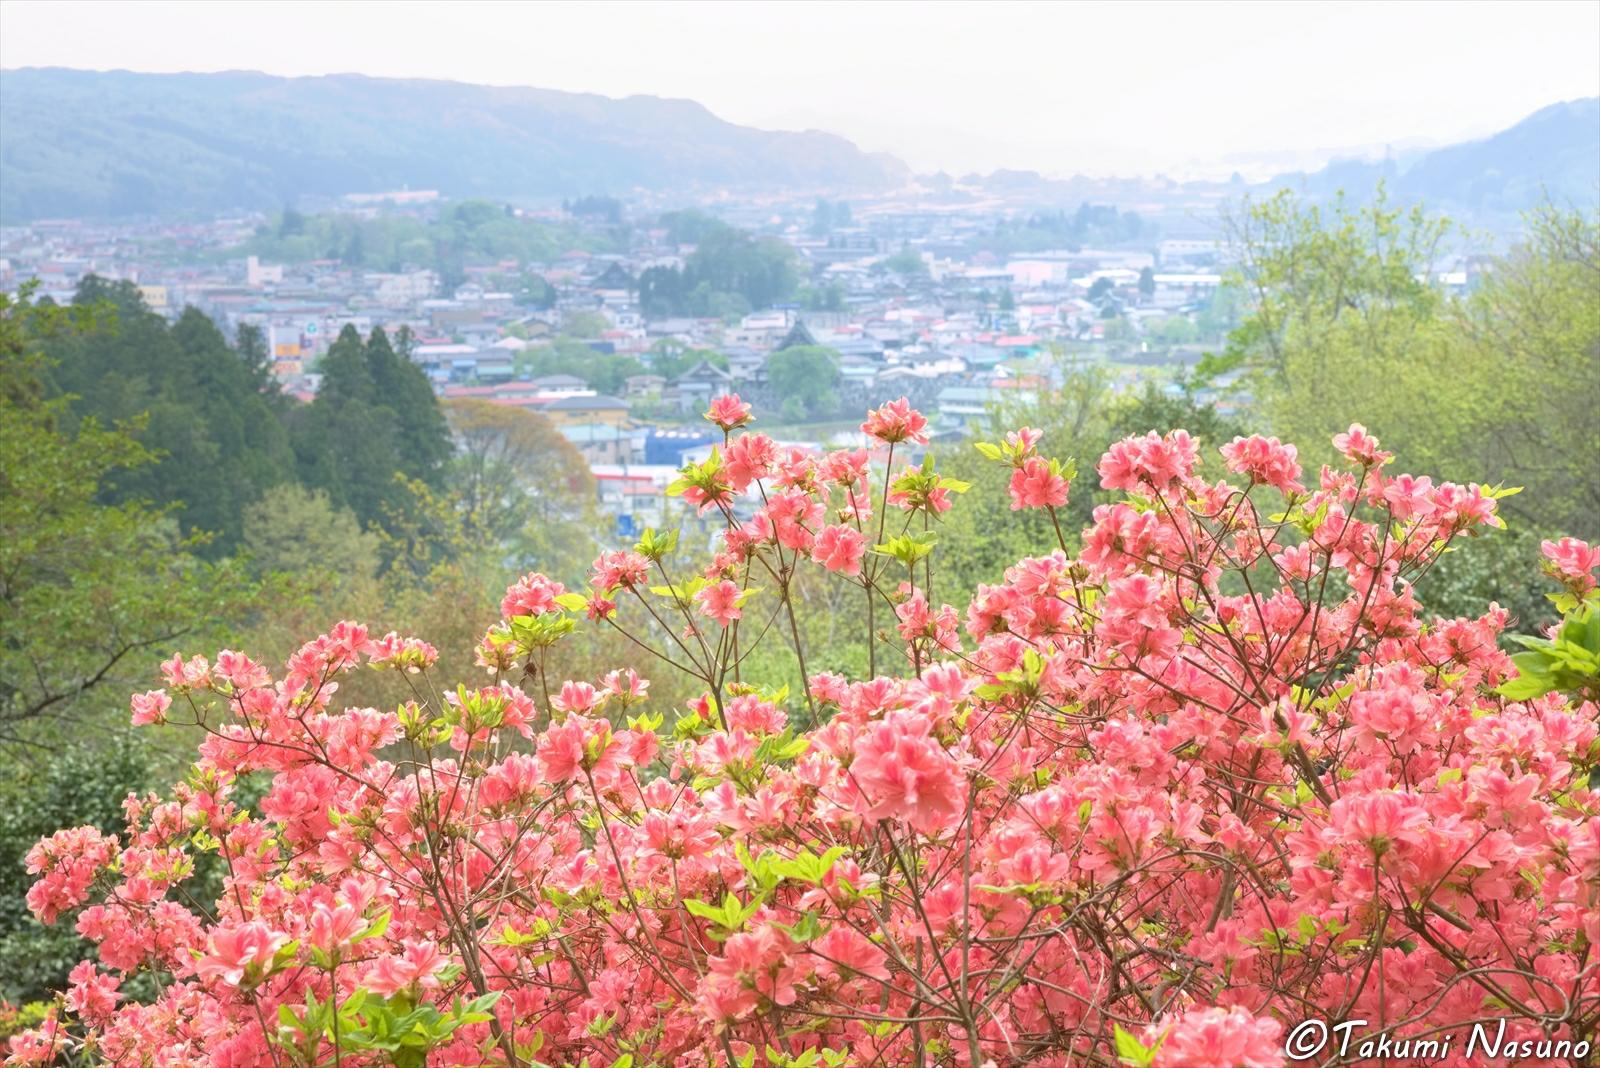 Azalea Blossoms at Akadate Park of Tanagura Town